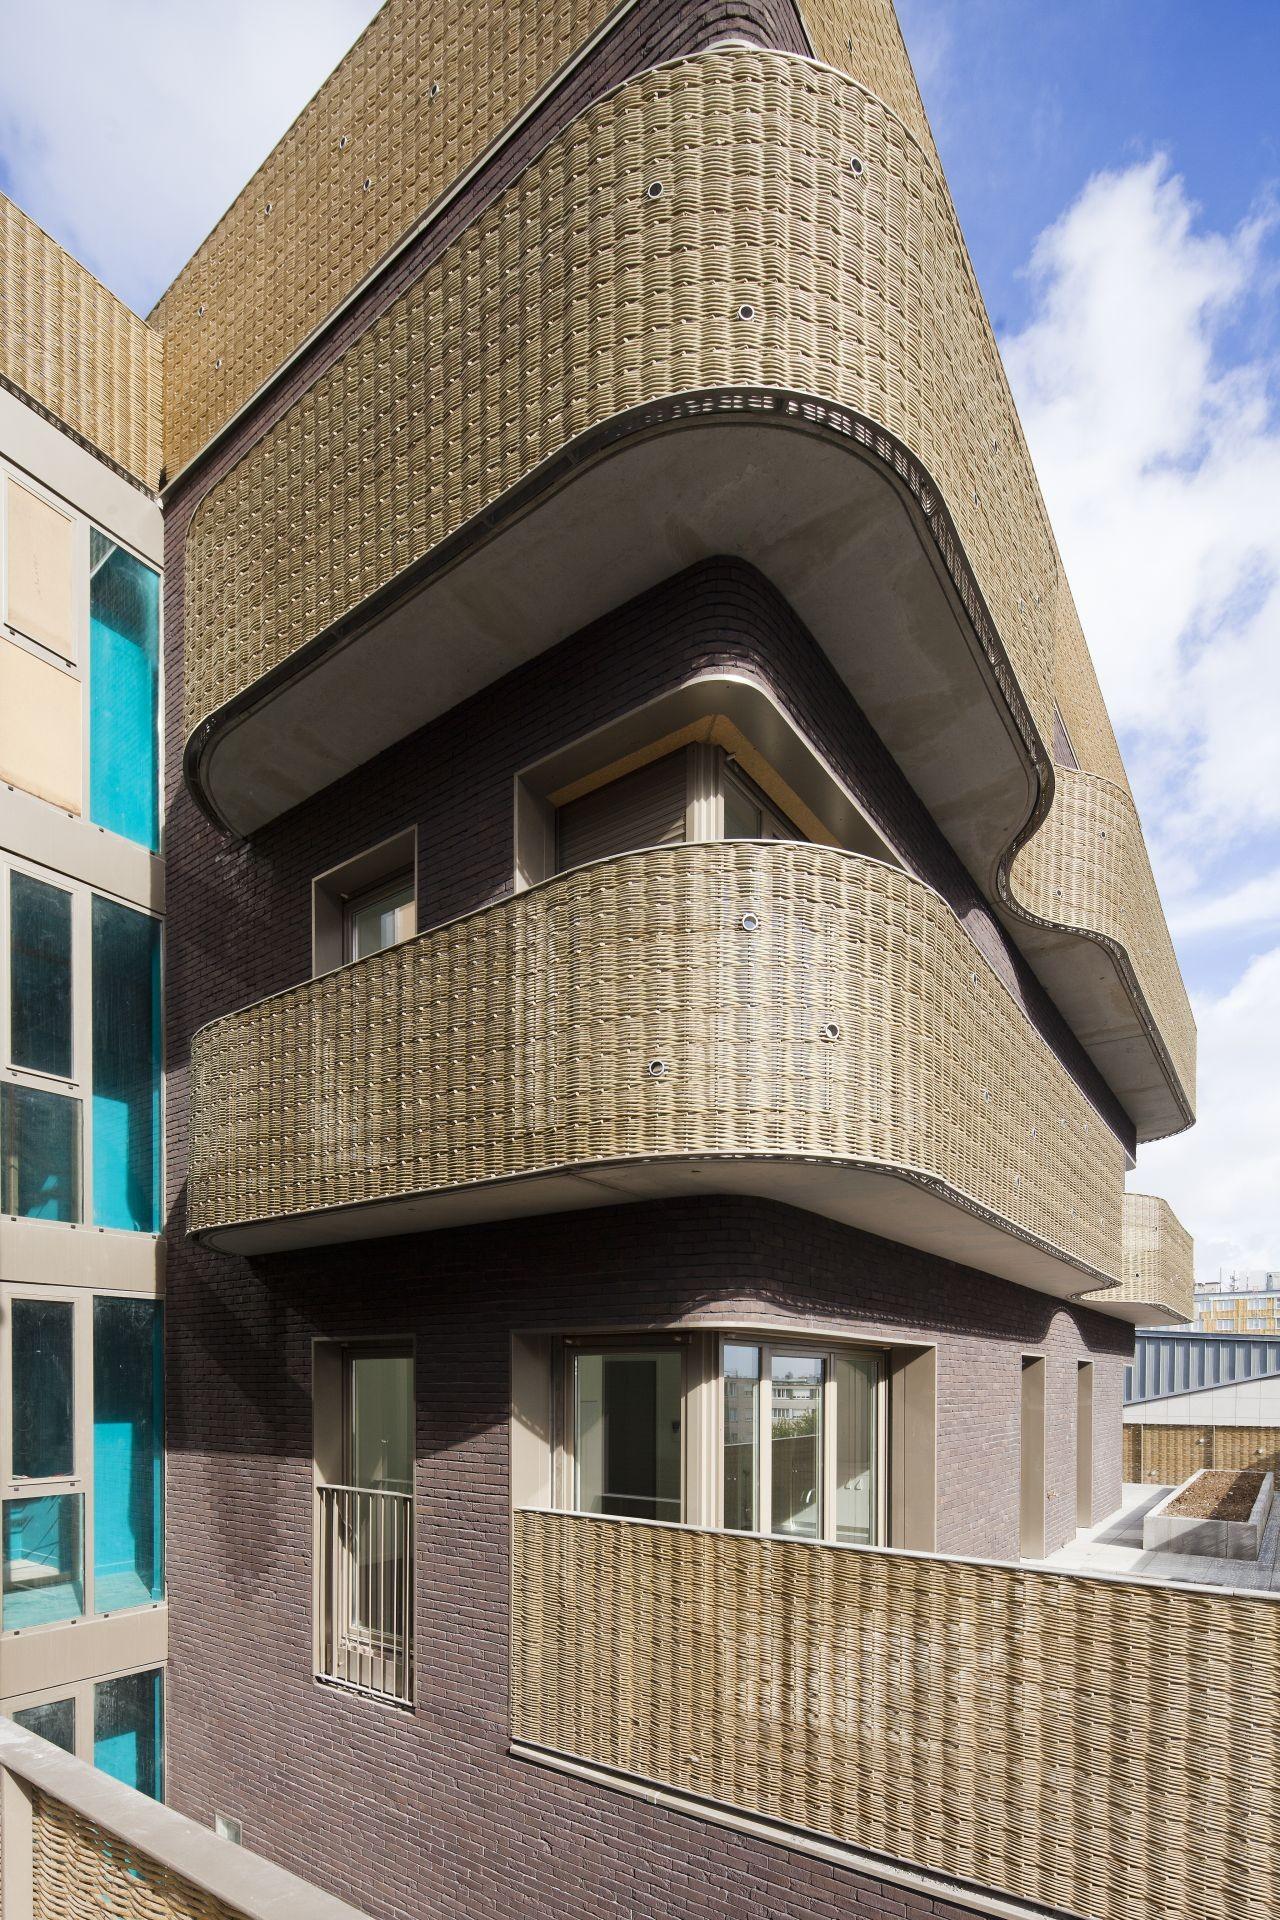 Gallery of le candide bruno rollet architecte 13 for Le architecte